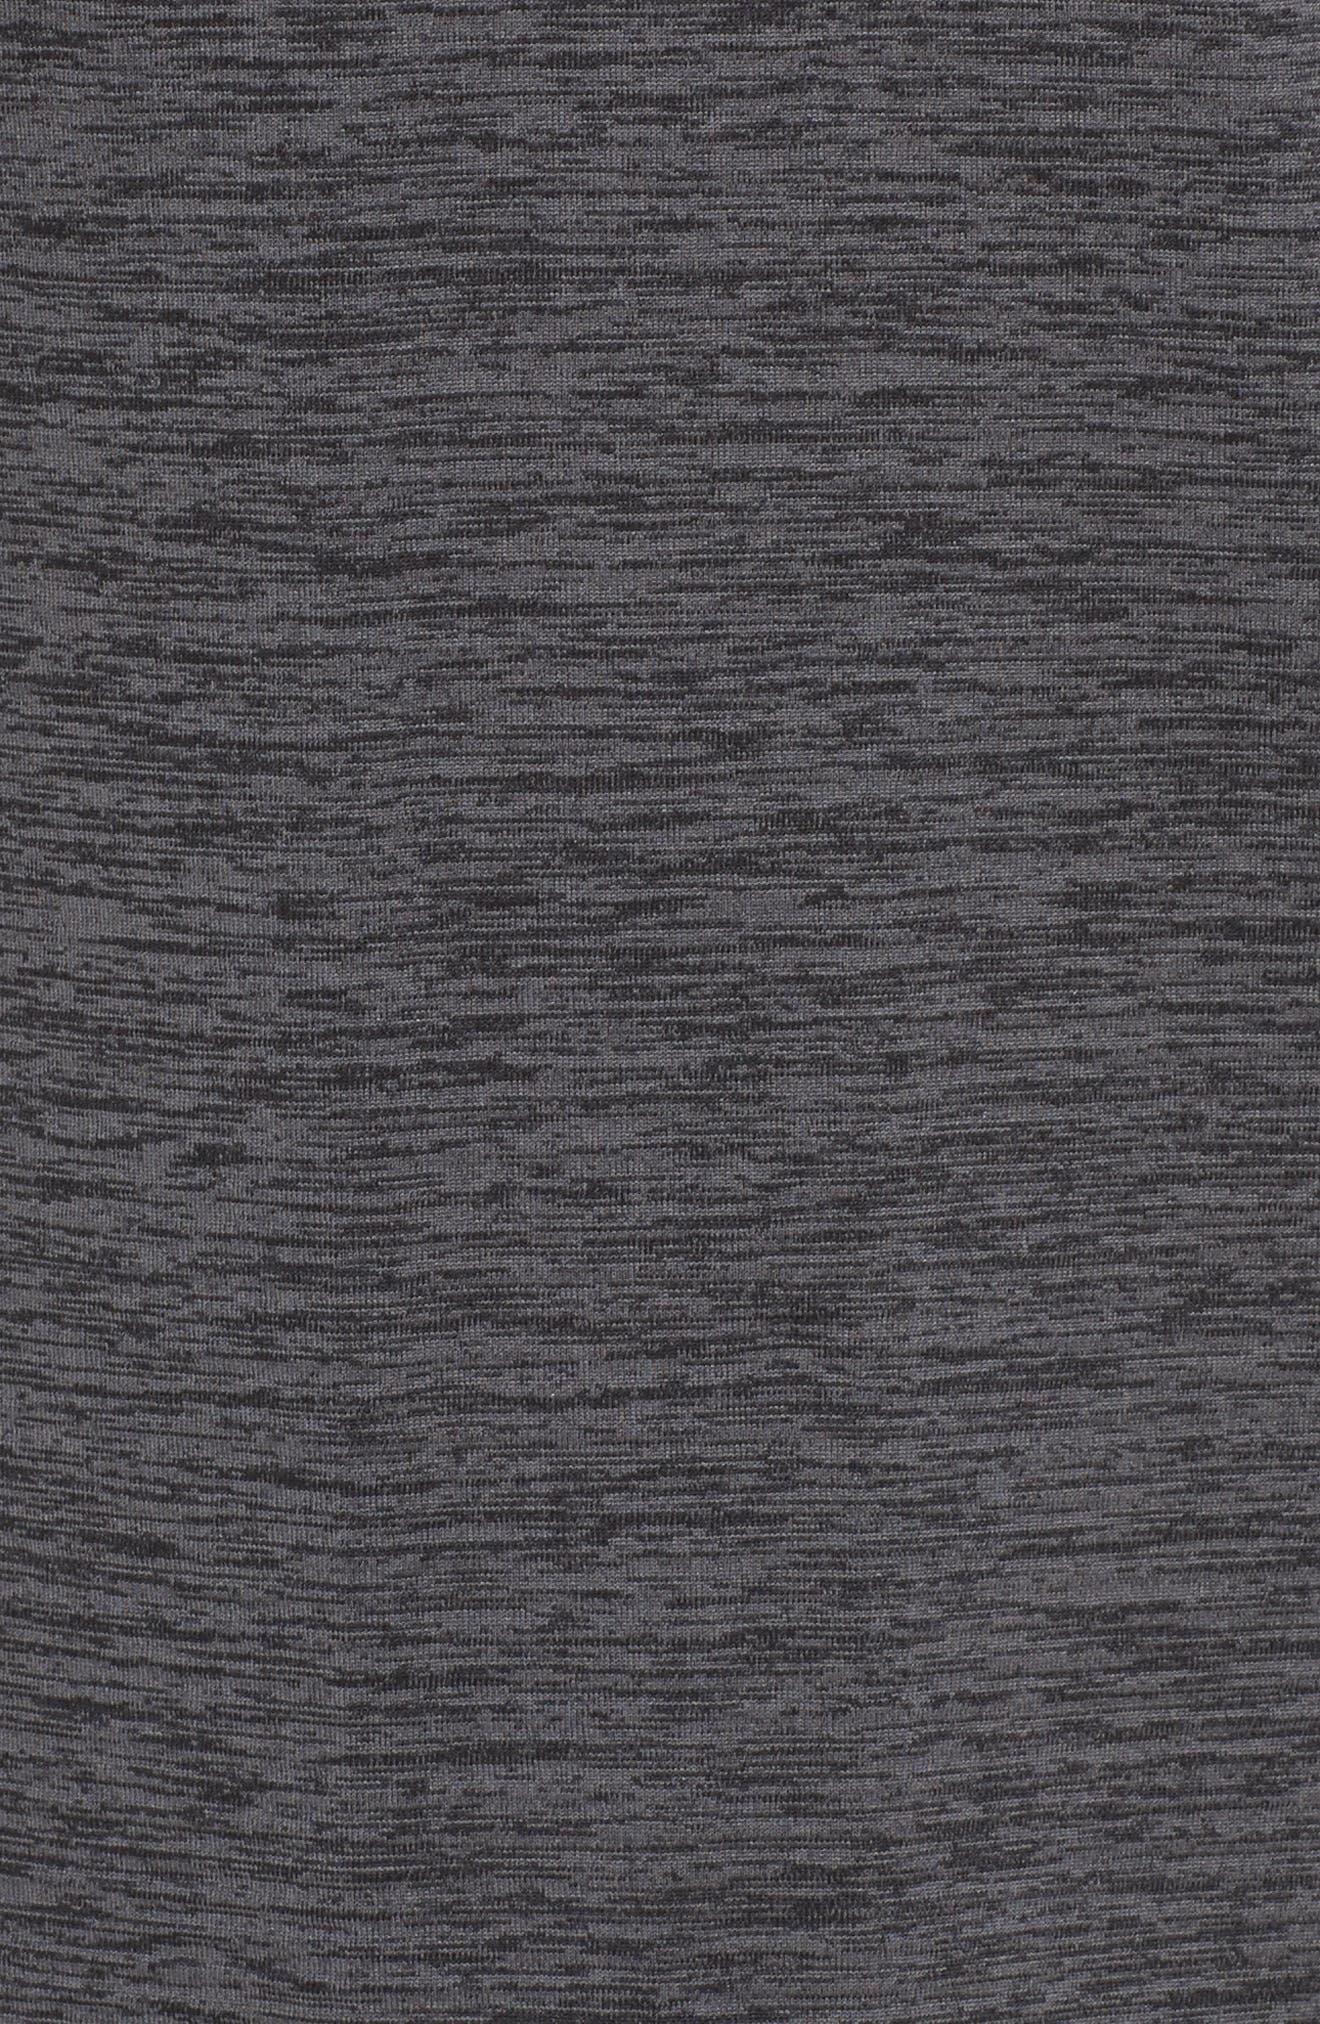 Therma Sphere Element Running Top,                             Alternate thumbnail 6, color,                             Black/ Htr/ Dark Grey